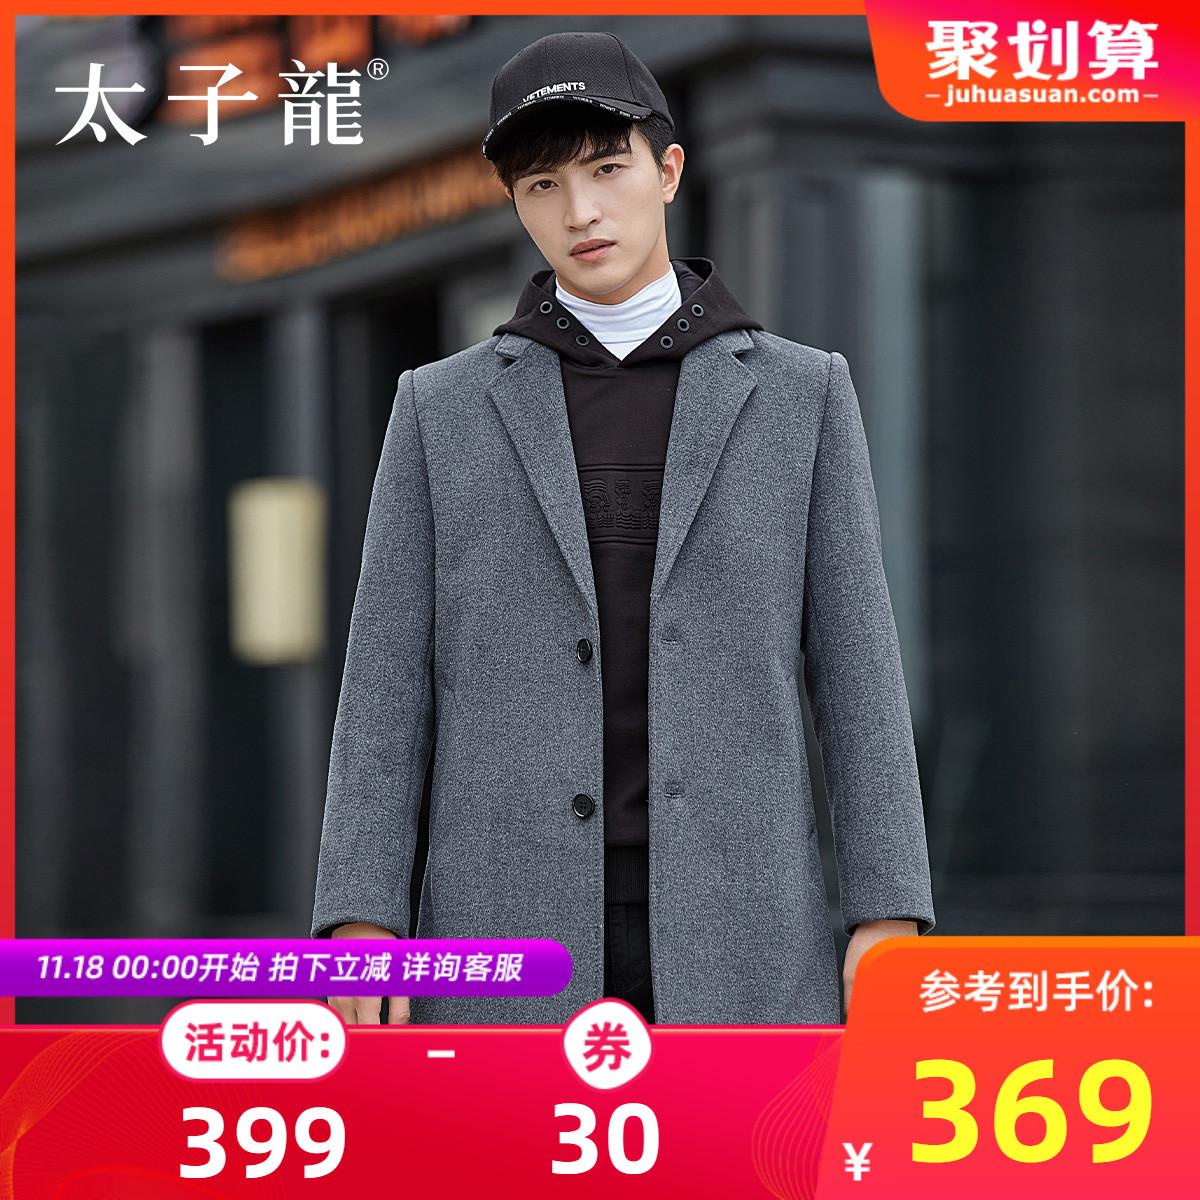 TEDELON/太子龙男装外套中长款2019秋冬新款时尚休闲男士毛呢大衣